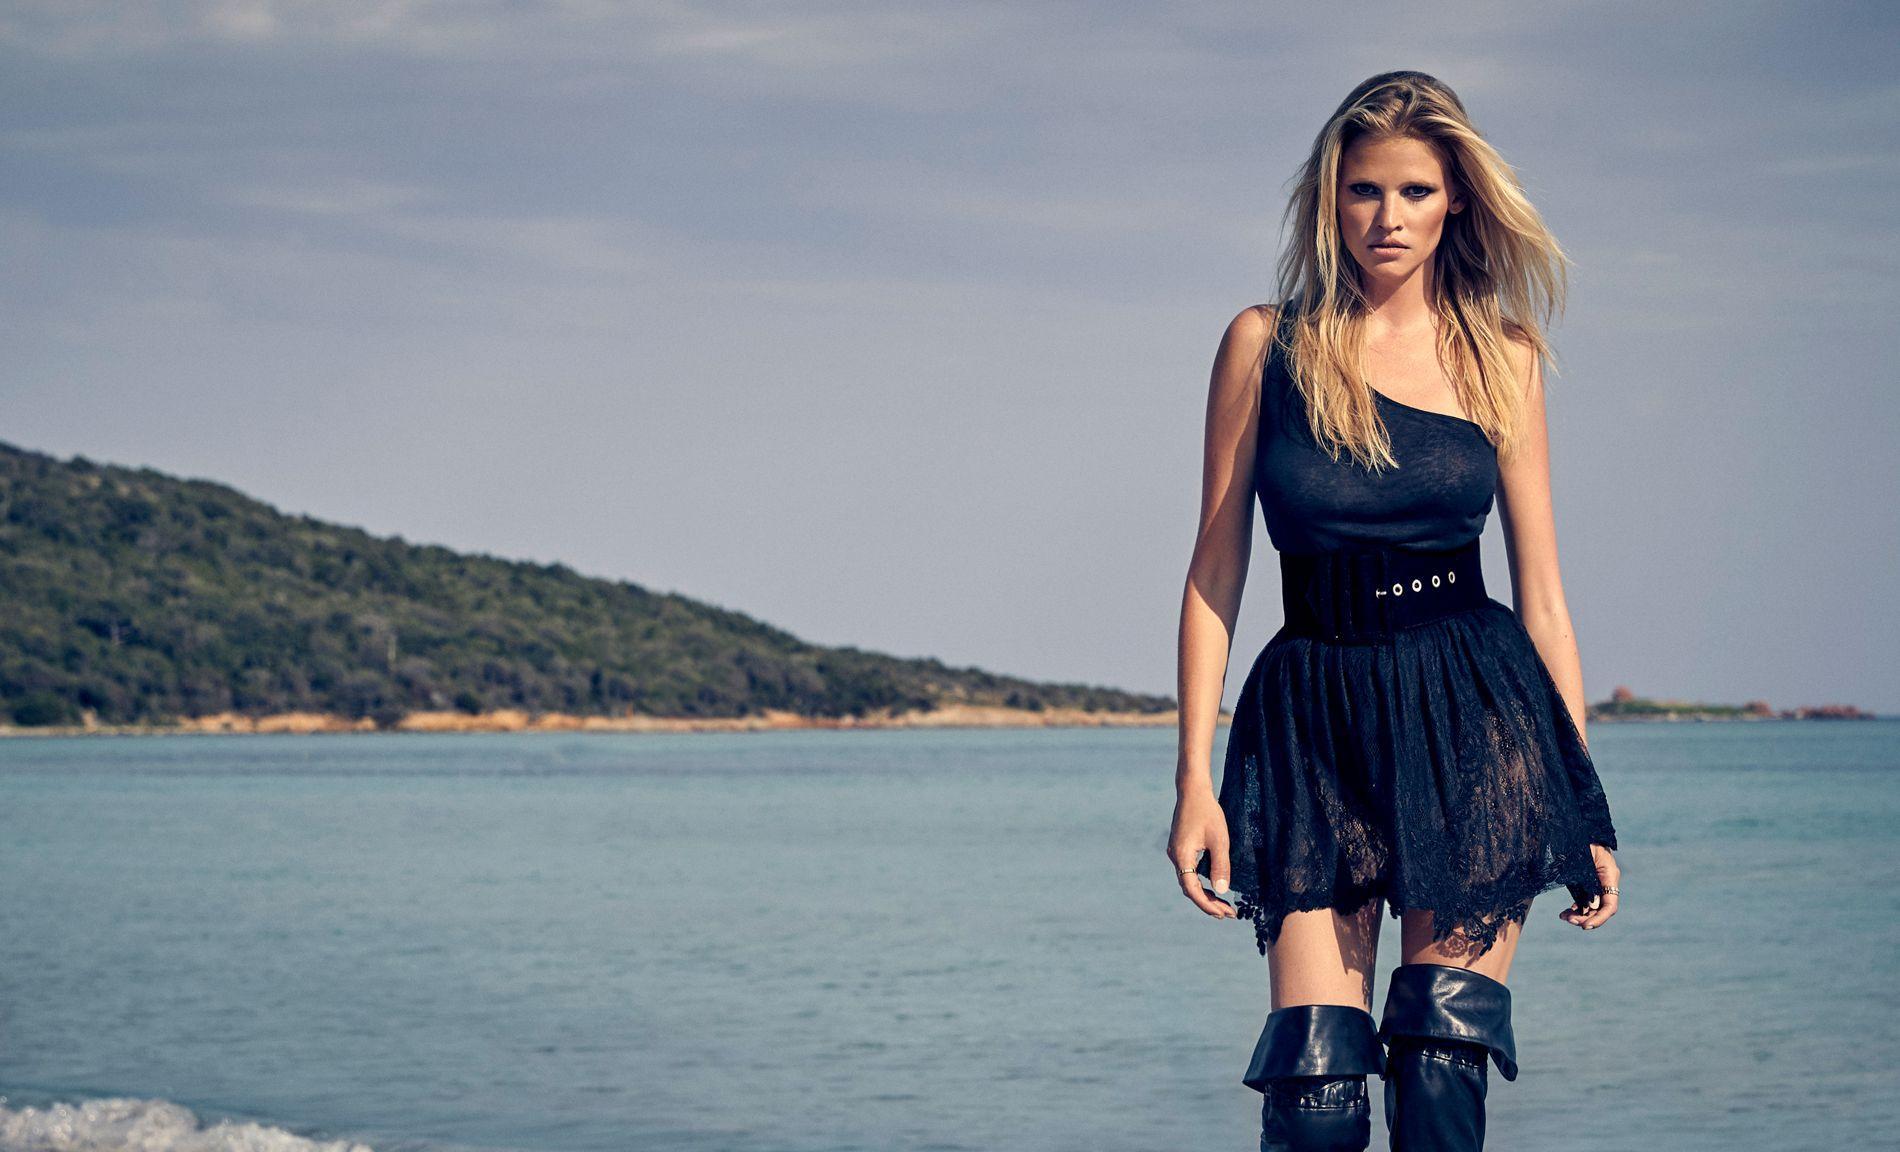 Lara Stone La Ressemblance Avec Brigitte Bardot S Arrete Au